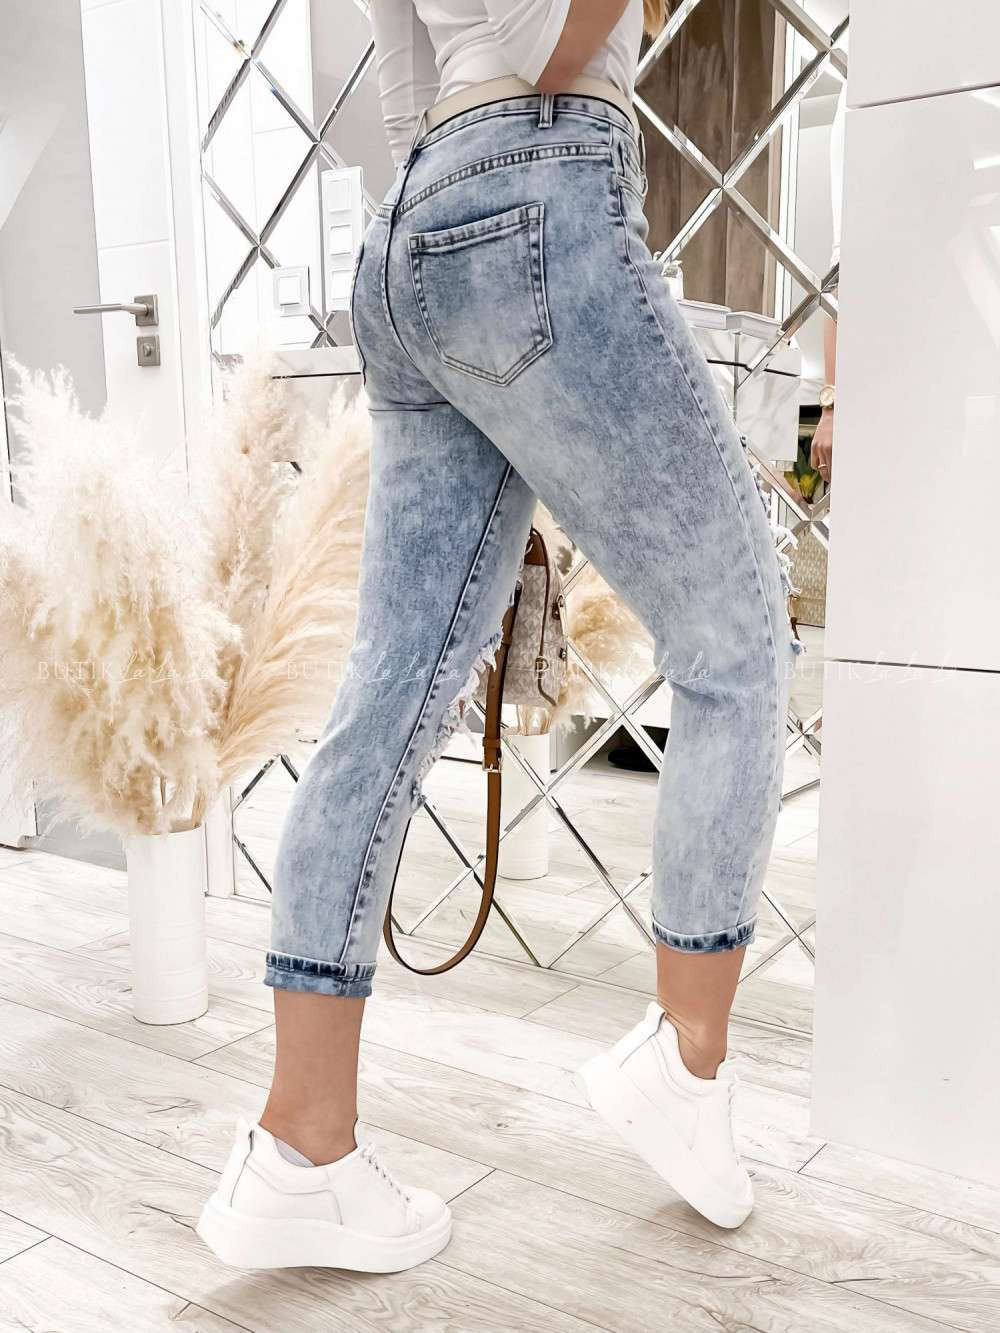 jeansy jasne